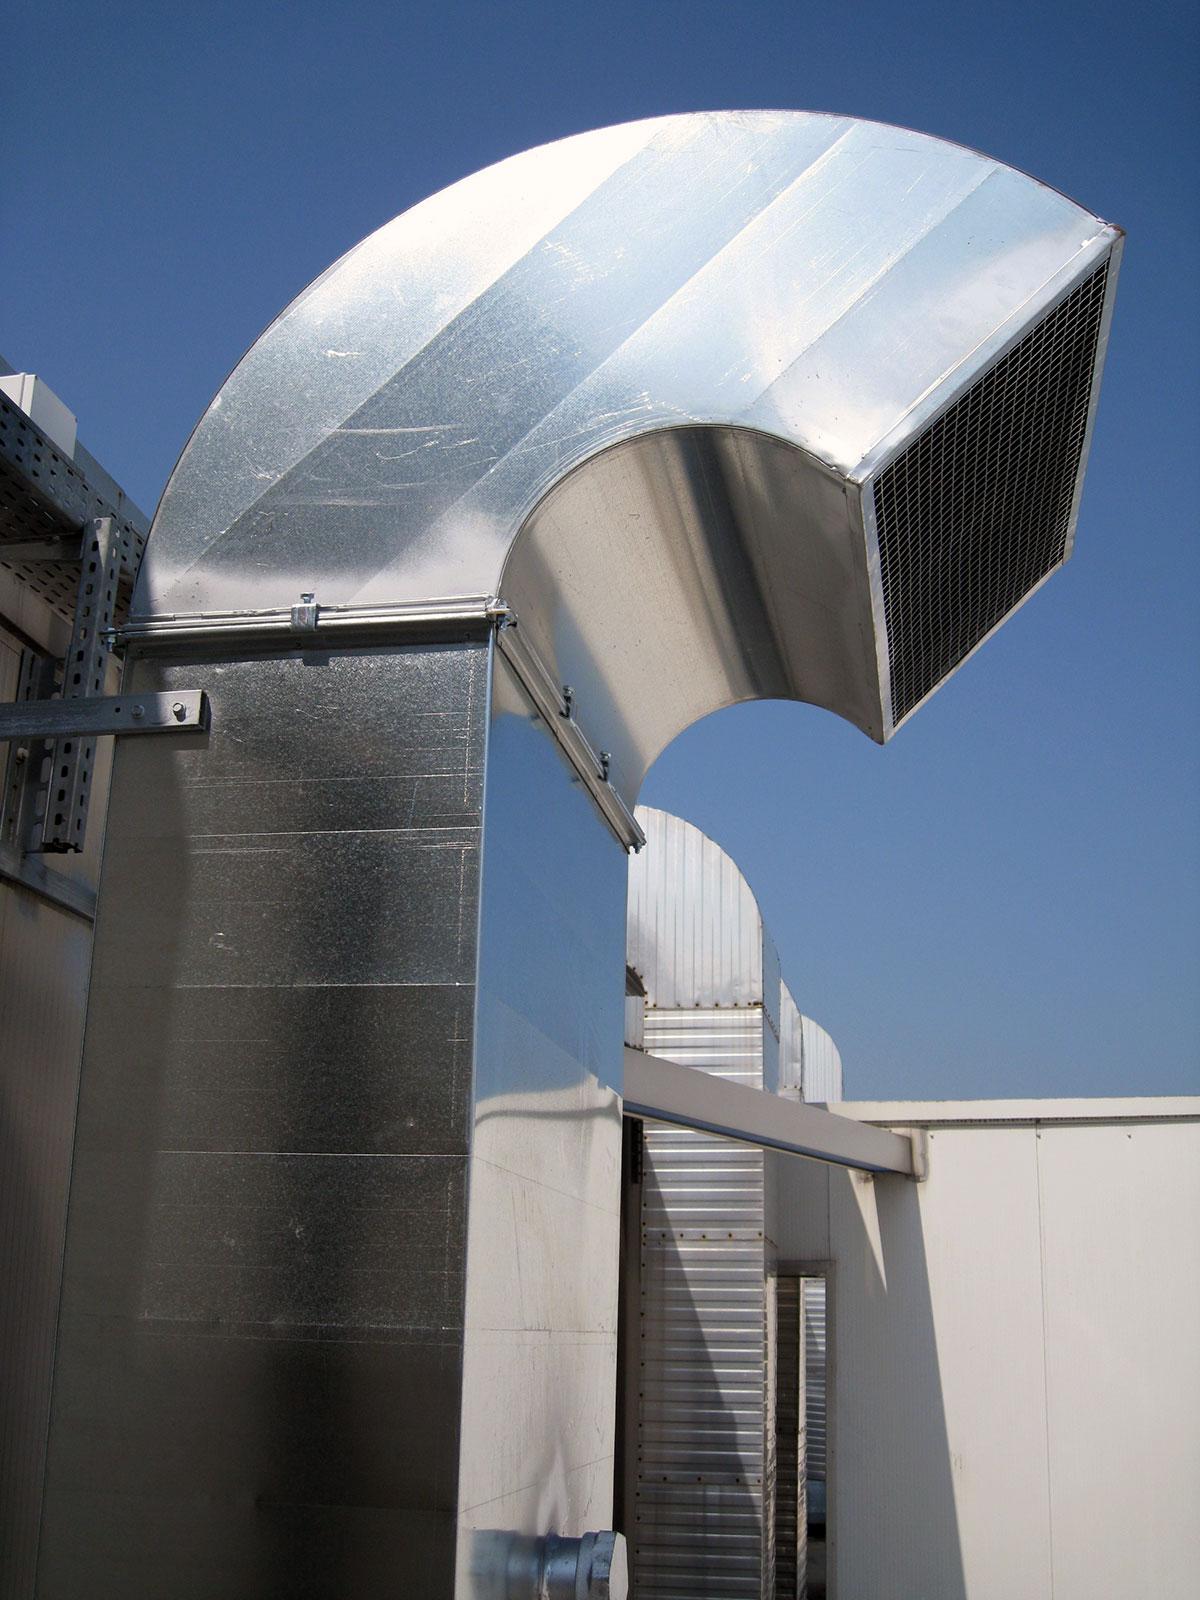 Gruppo ingegneria Torino - adeguamento dei camini D. LGS. 152/06